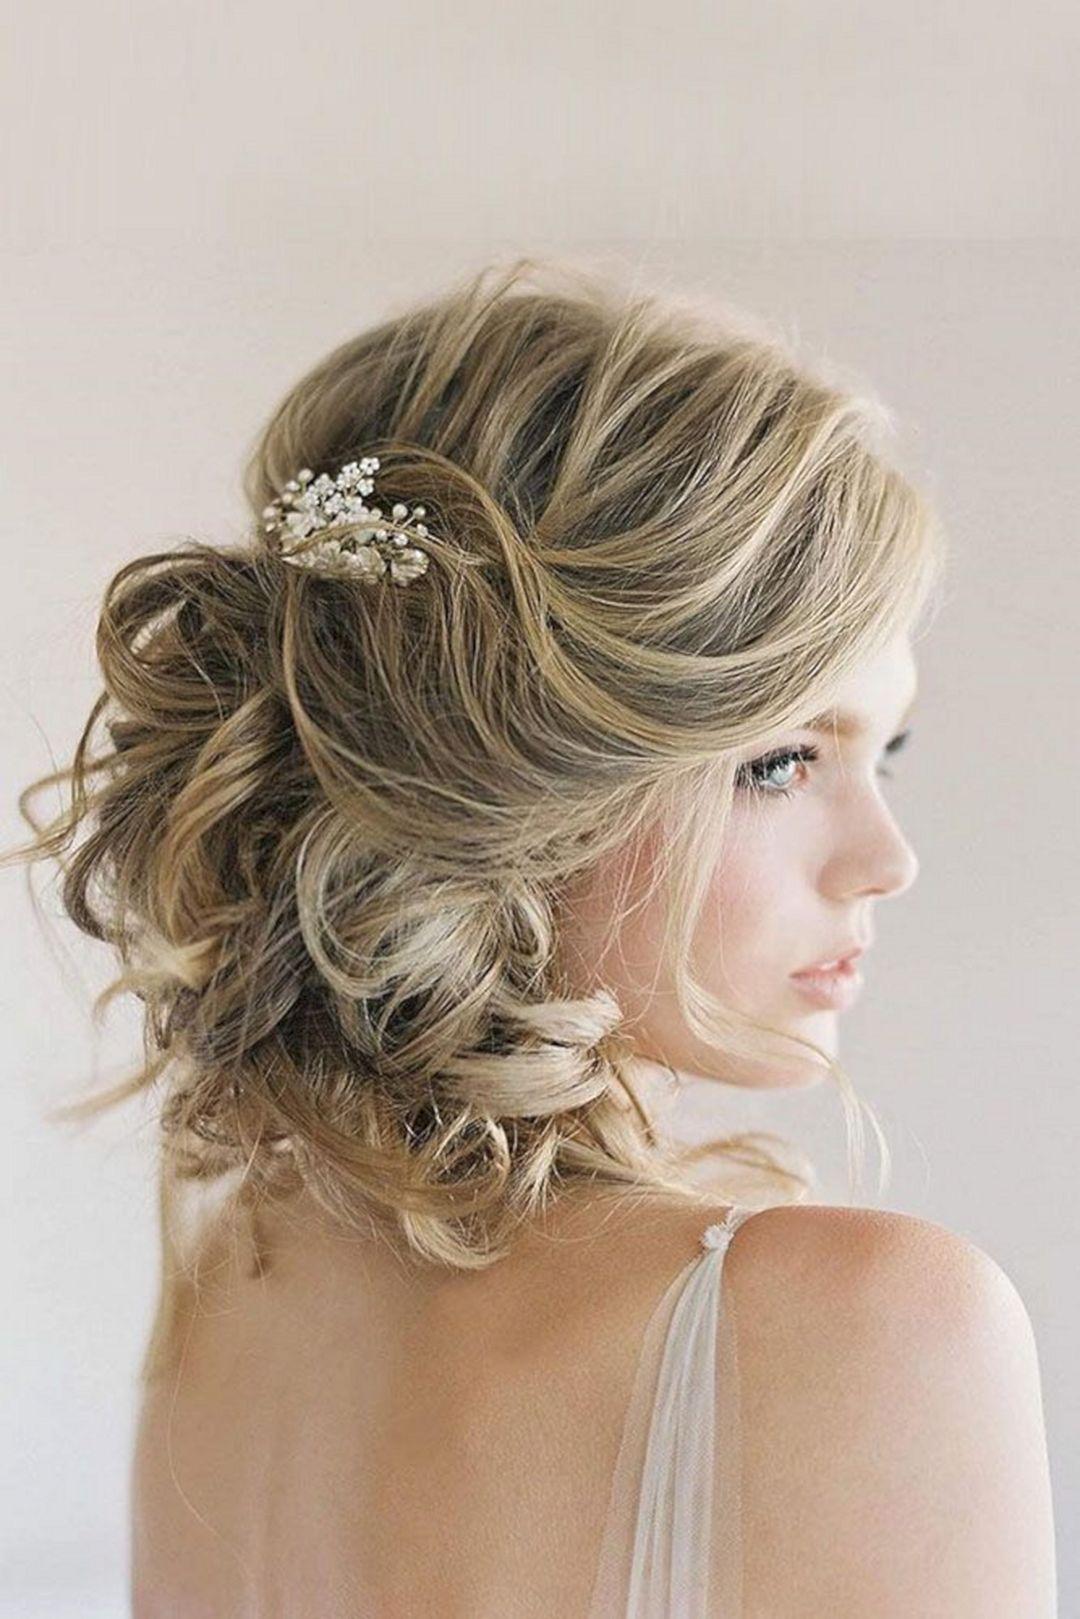 25+ elegant short updo hairstyles for summer weddings ideas